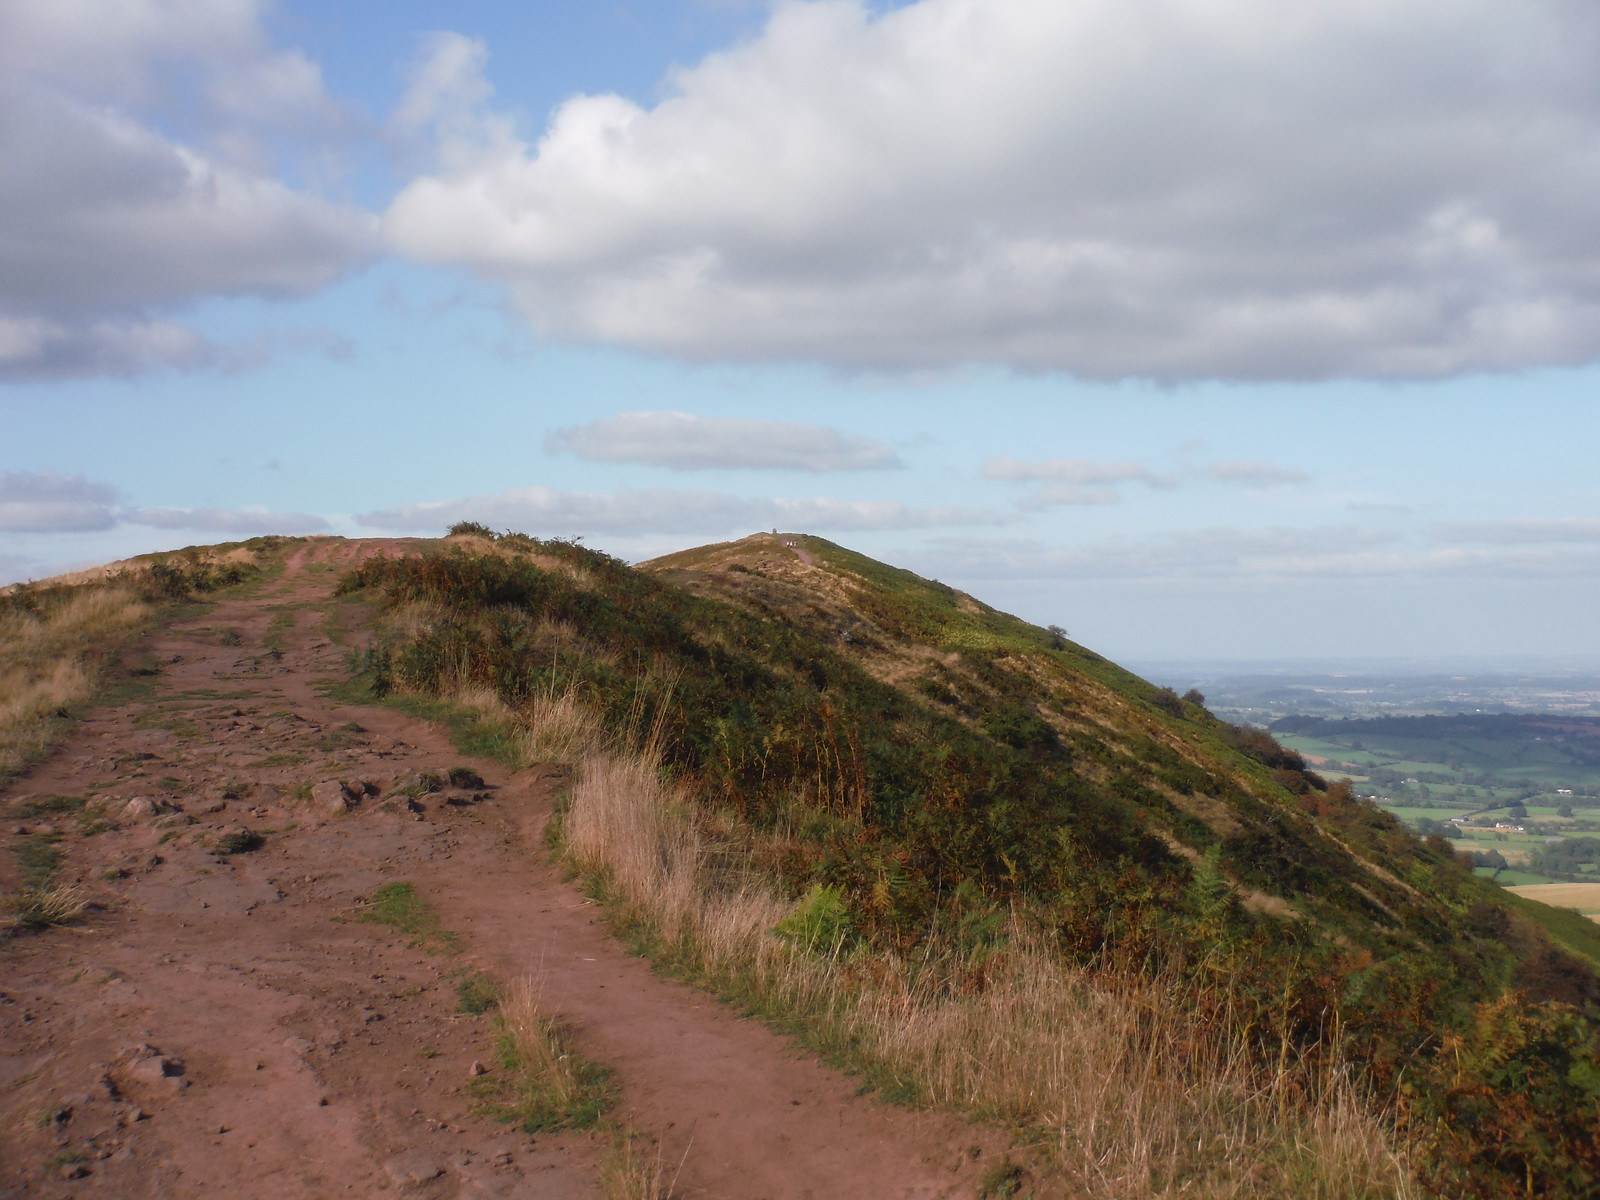 The ridge of The Skirrid SWC Walk 347 - Llanvihangel Crucorney Circular (via Bryn Arw and The Skirrid)